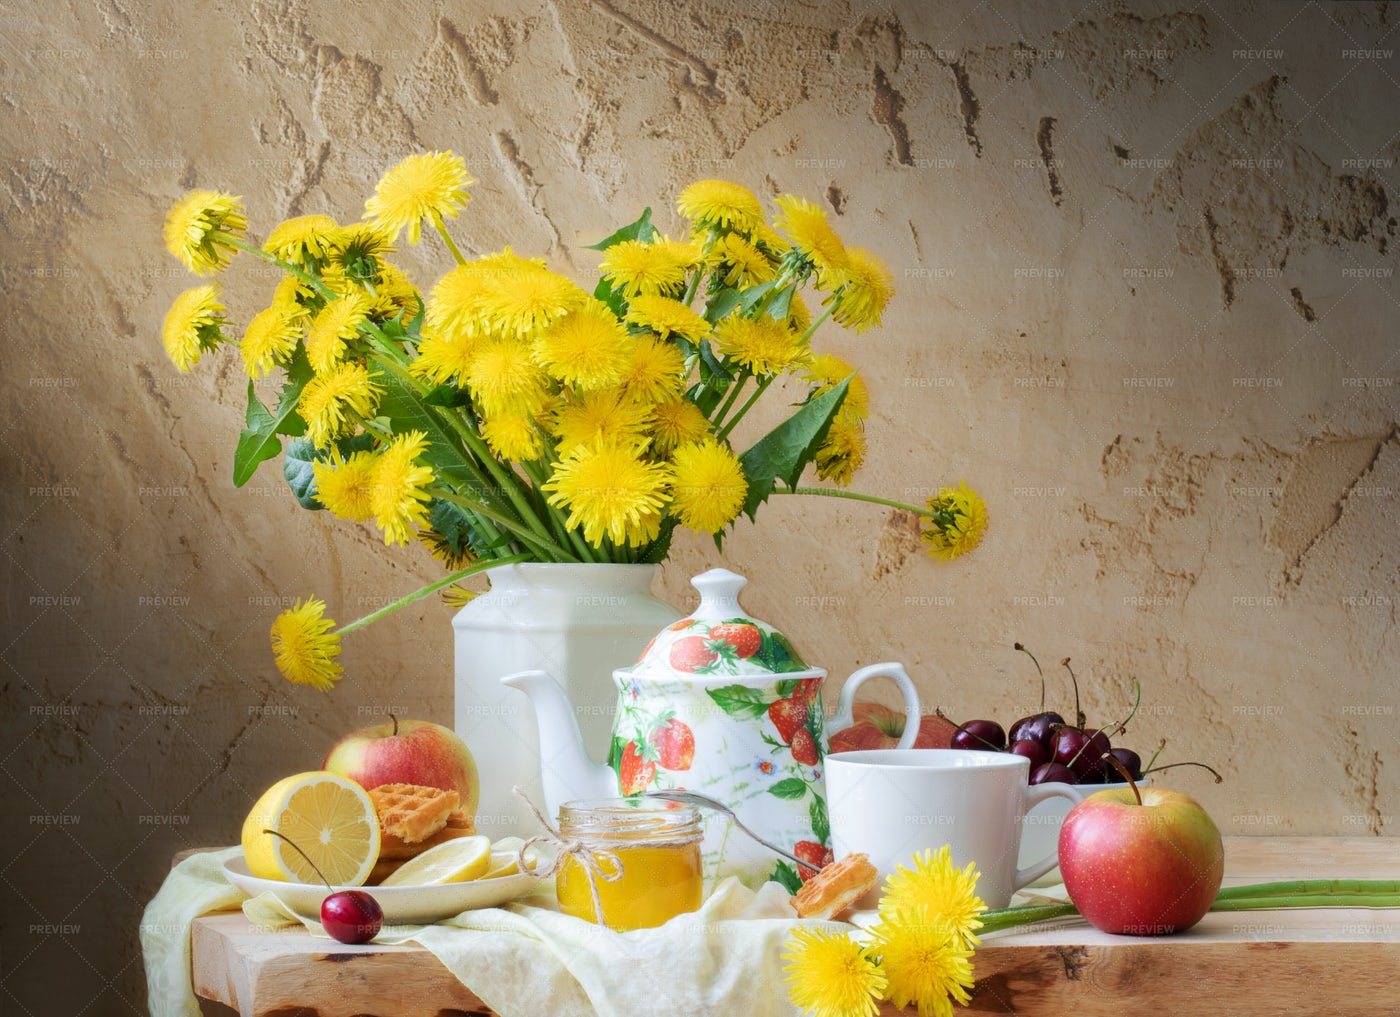 Dandelions, Tea And Fruit: Stock Photos